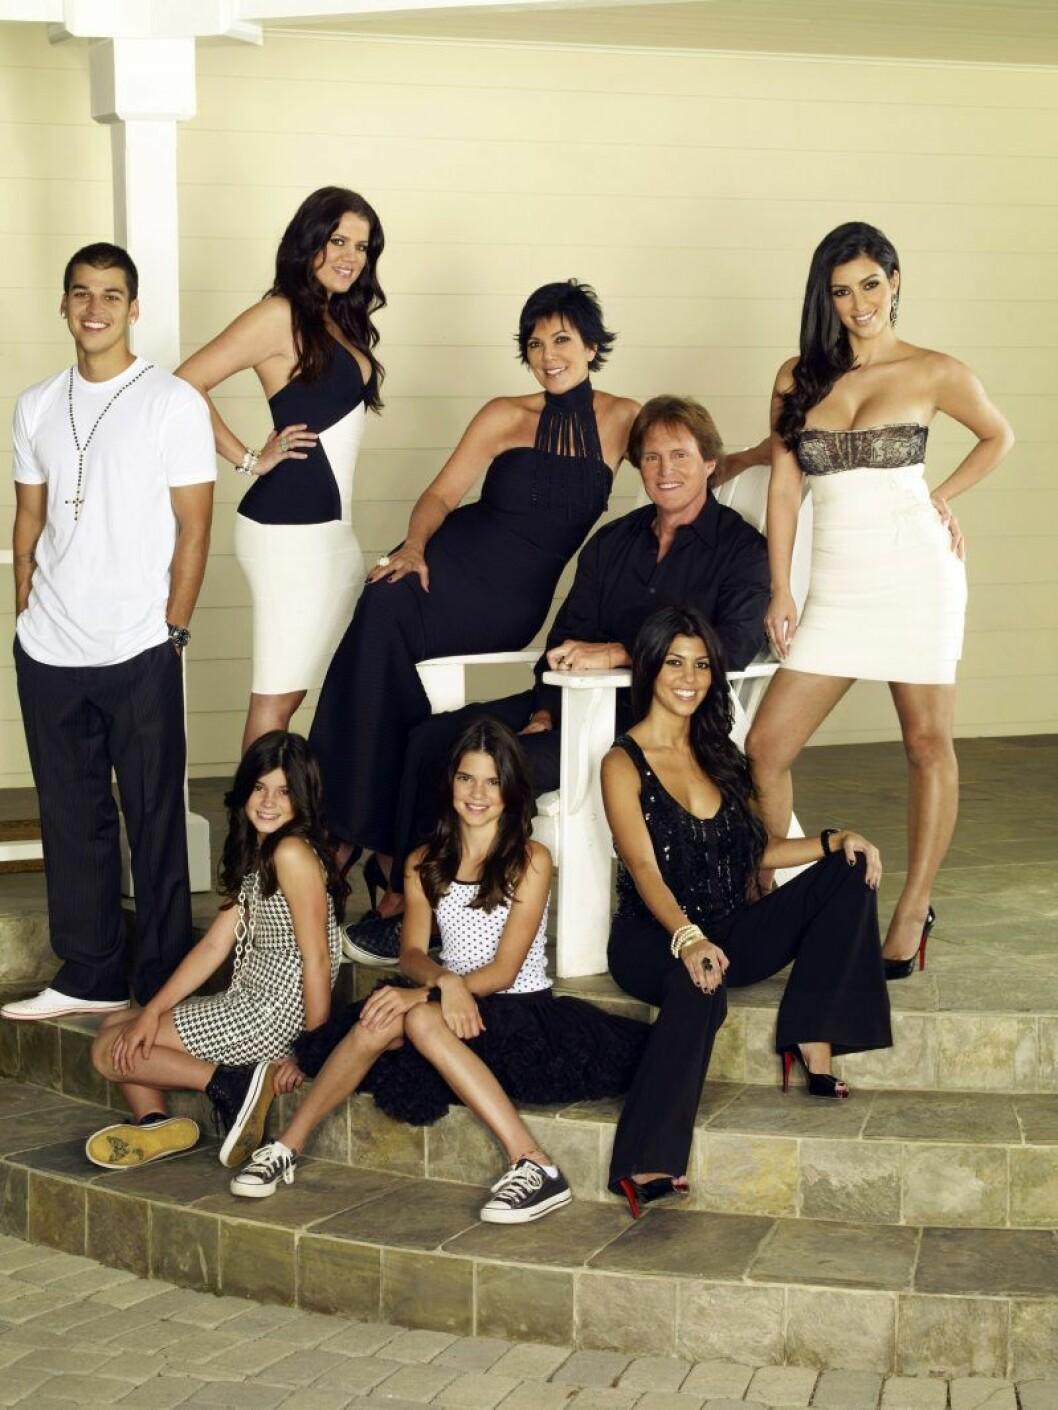 Hela familjen Kardashian/Jenner står och sitter i en trappa